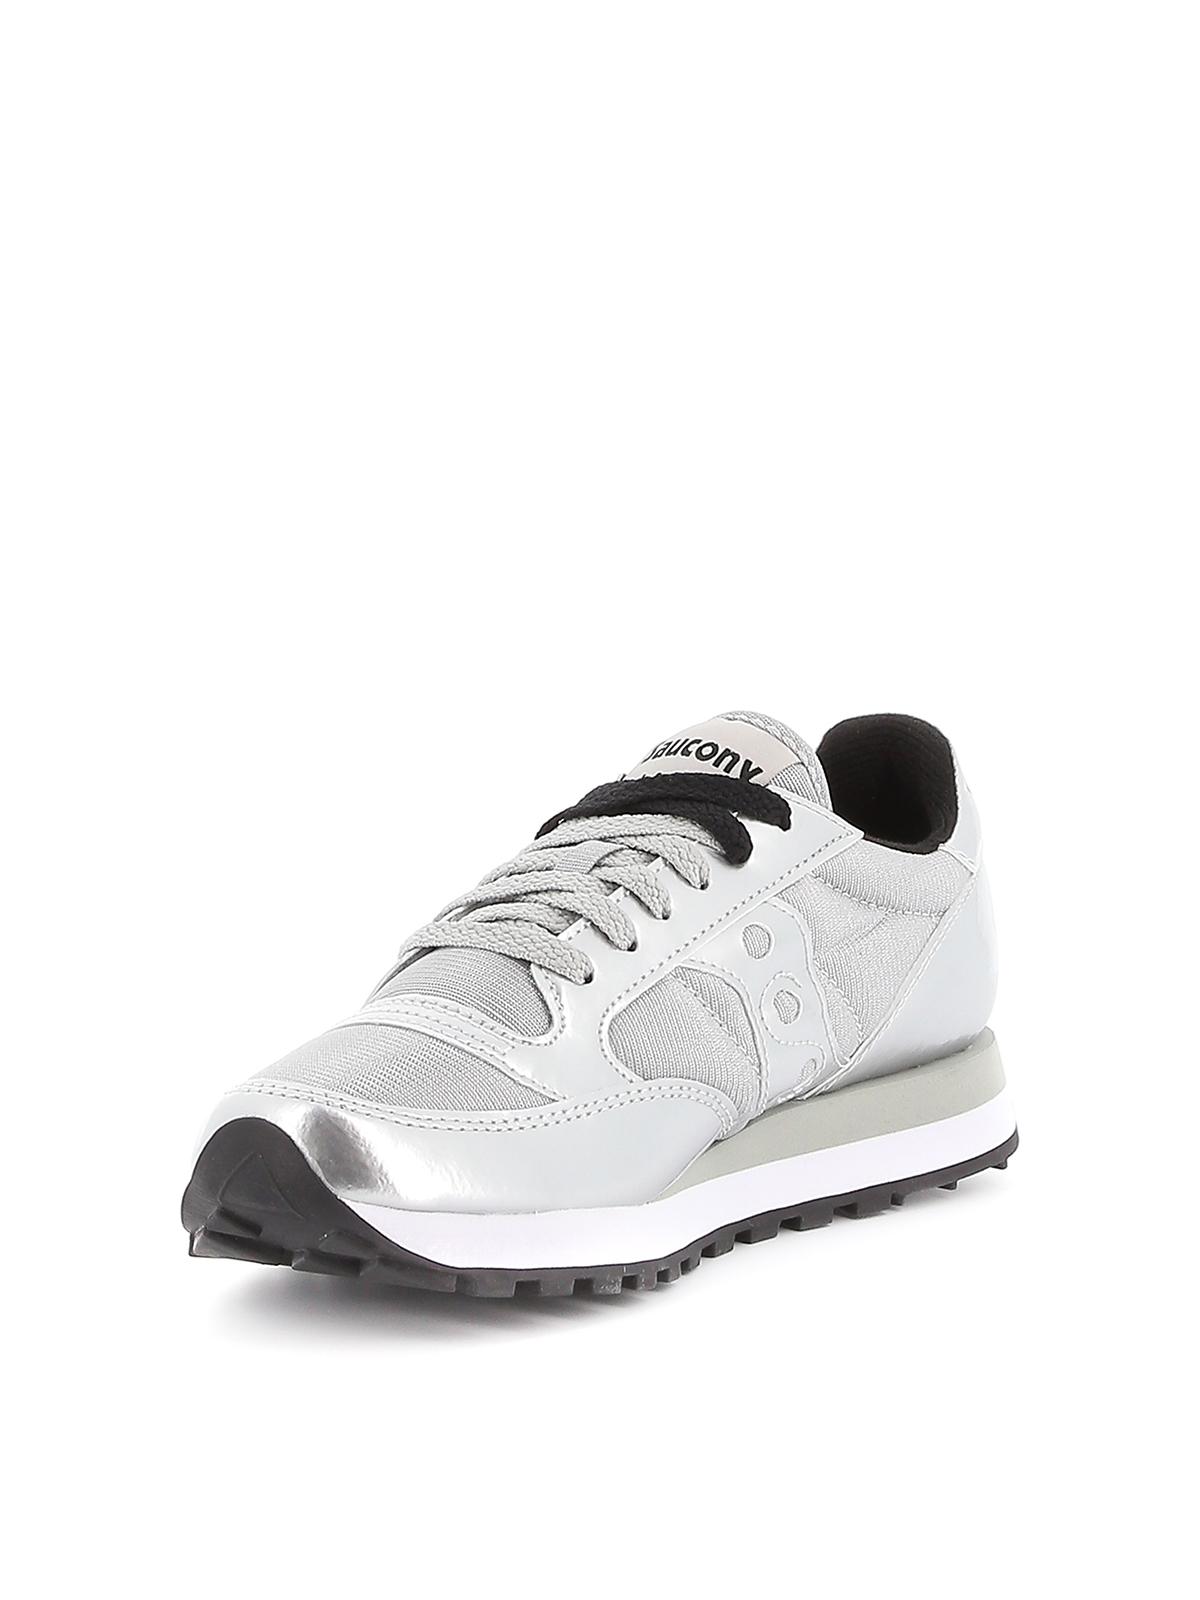 Saucony - Jazz Original silver sneakers